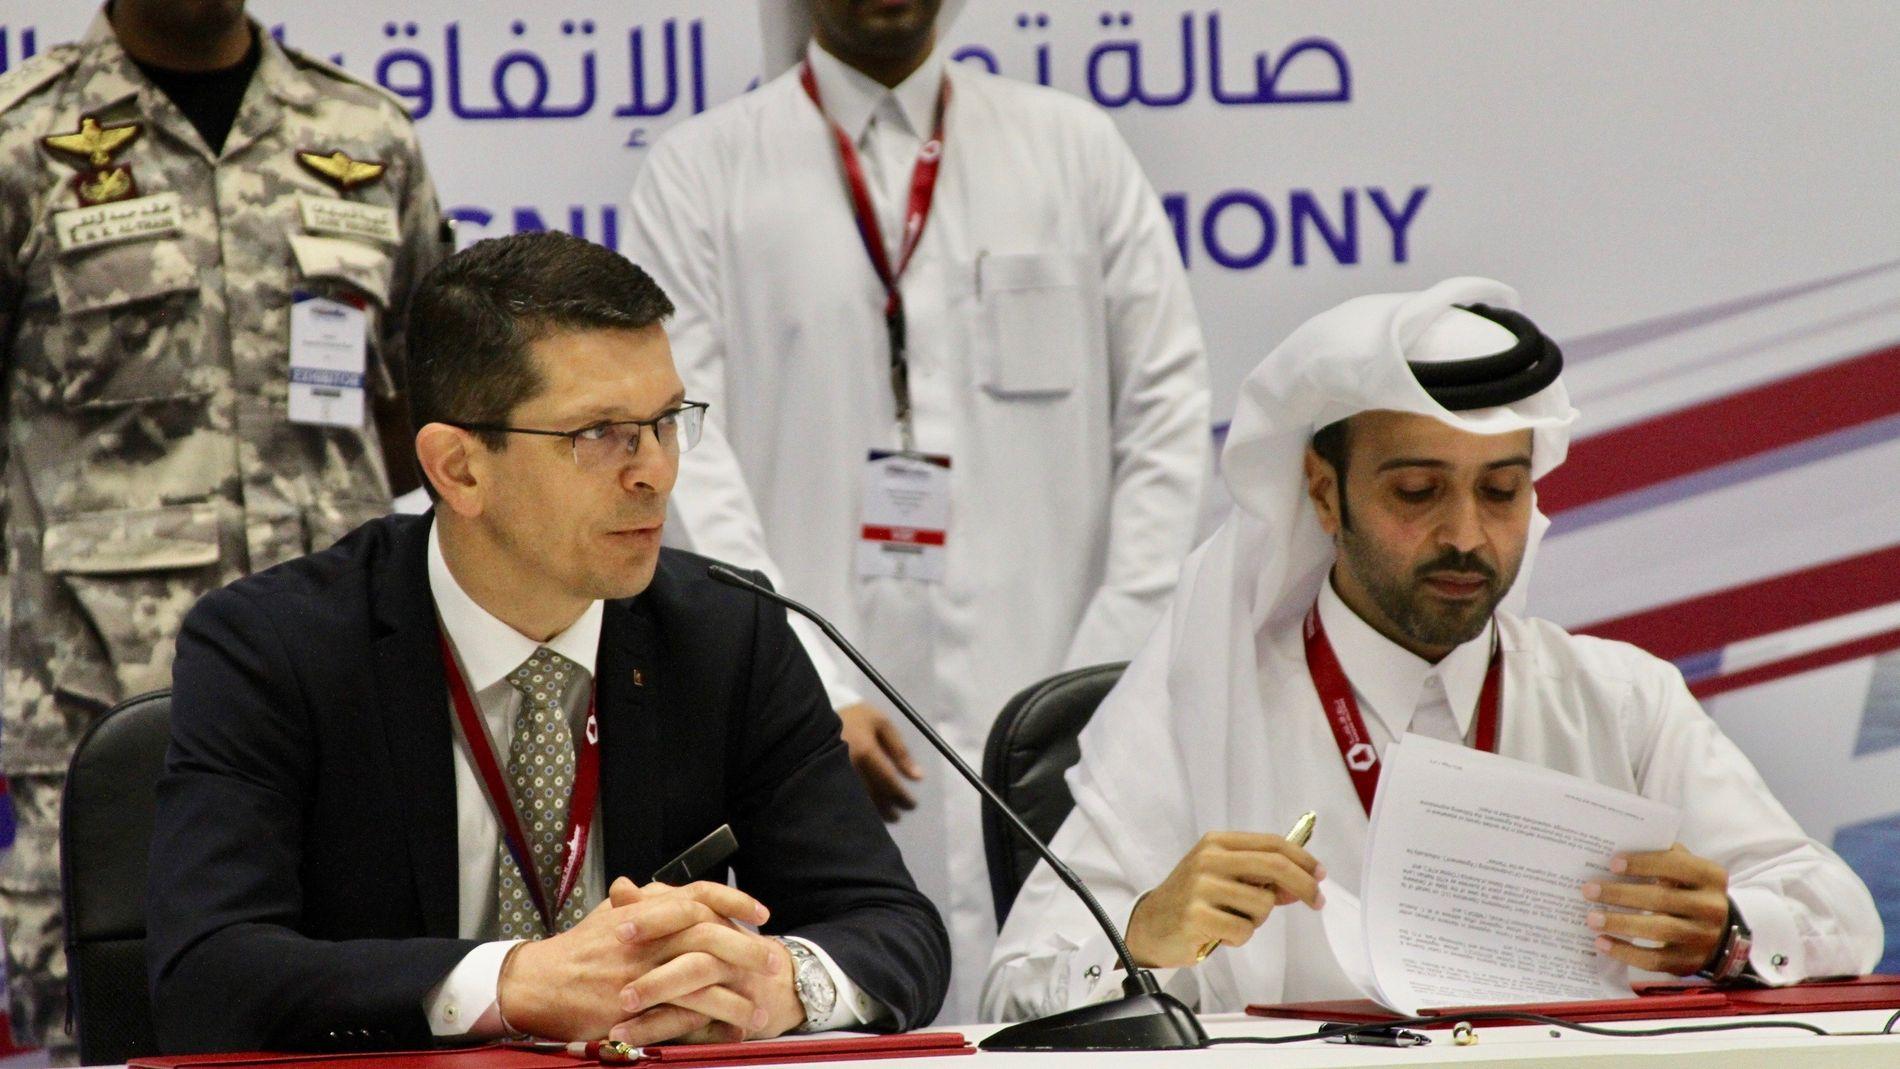 Konsernsjef Geir Håøy i Kongsberg Gruppen signerer gigantavtalen i Qatar med konsernsjefen i Barzan Holdings, Nasser Hassan Al-Naimi, under Doha International Maritime Defense Exhibition (Dimdex).